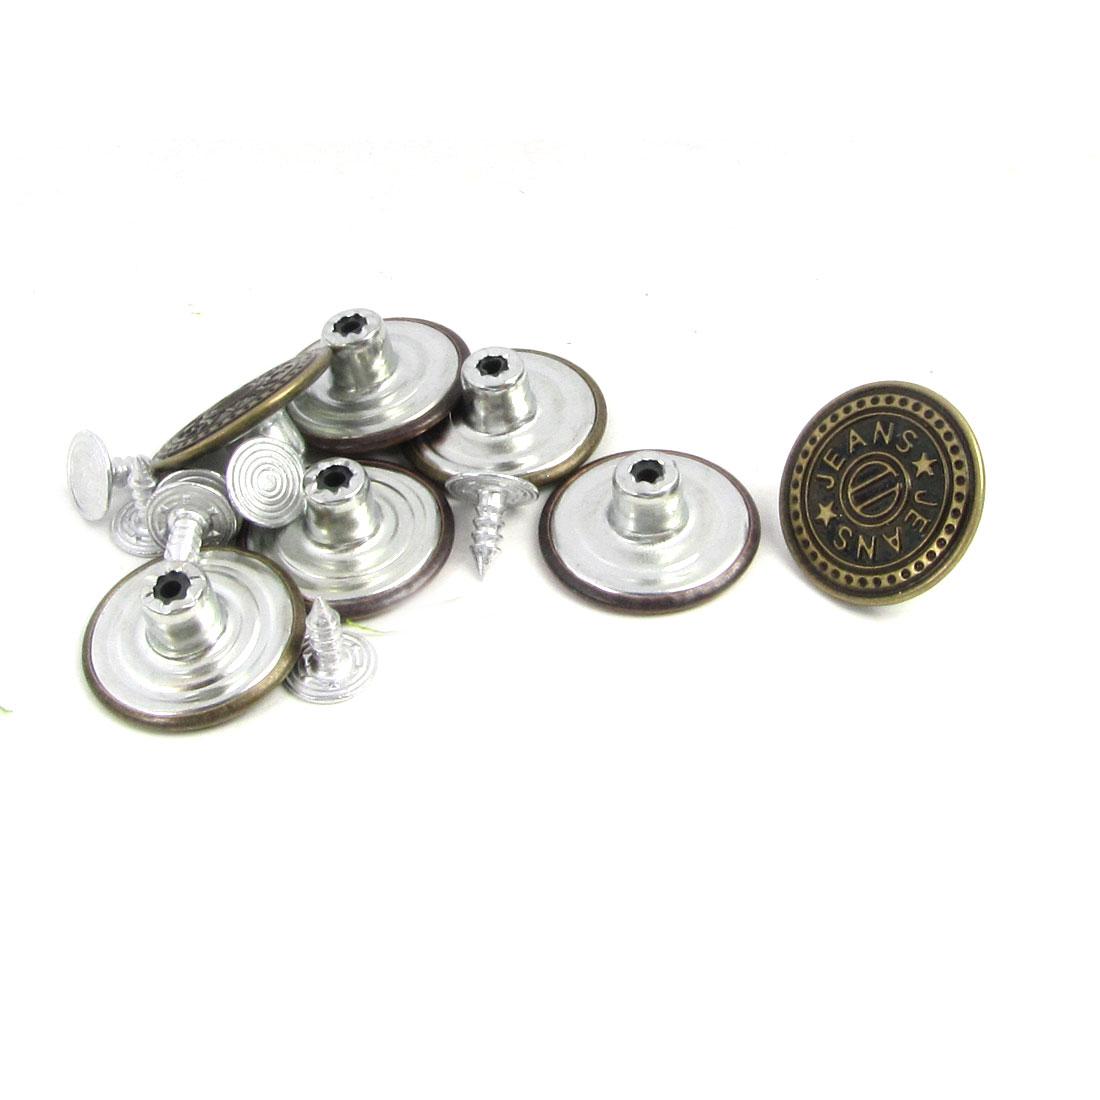 7 Pcs Bronze Tone Letter Pattern Metallic Tack Buttons Rivet for Jeans